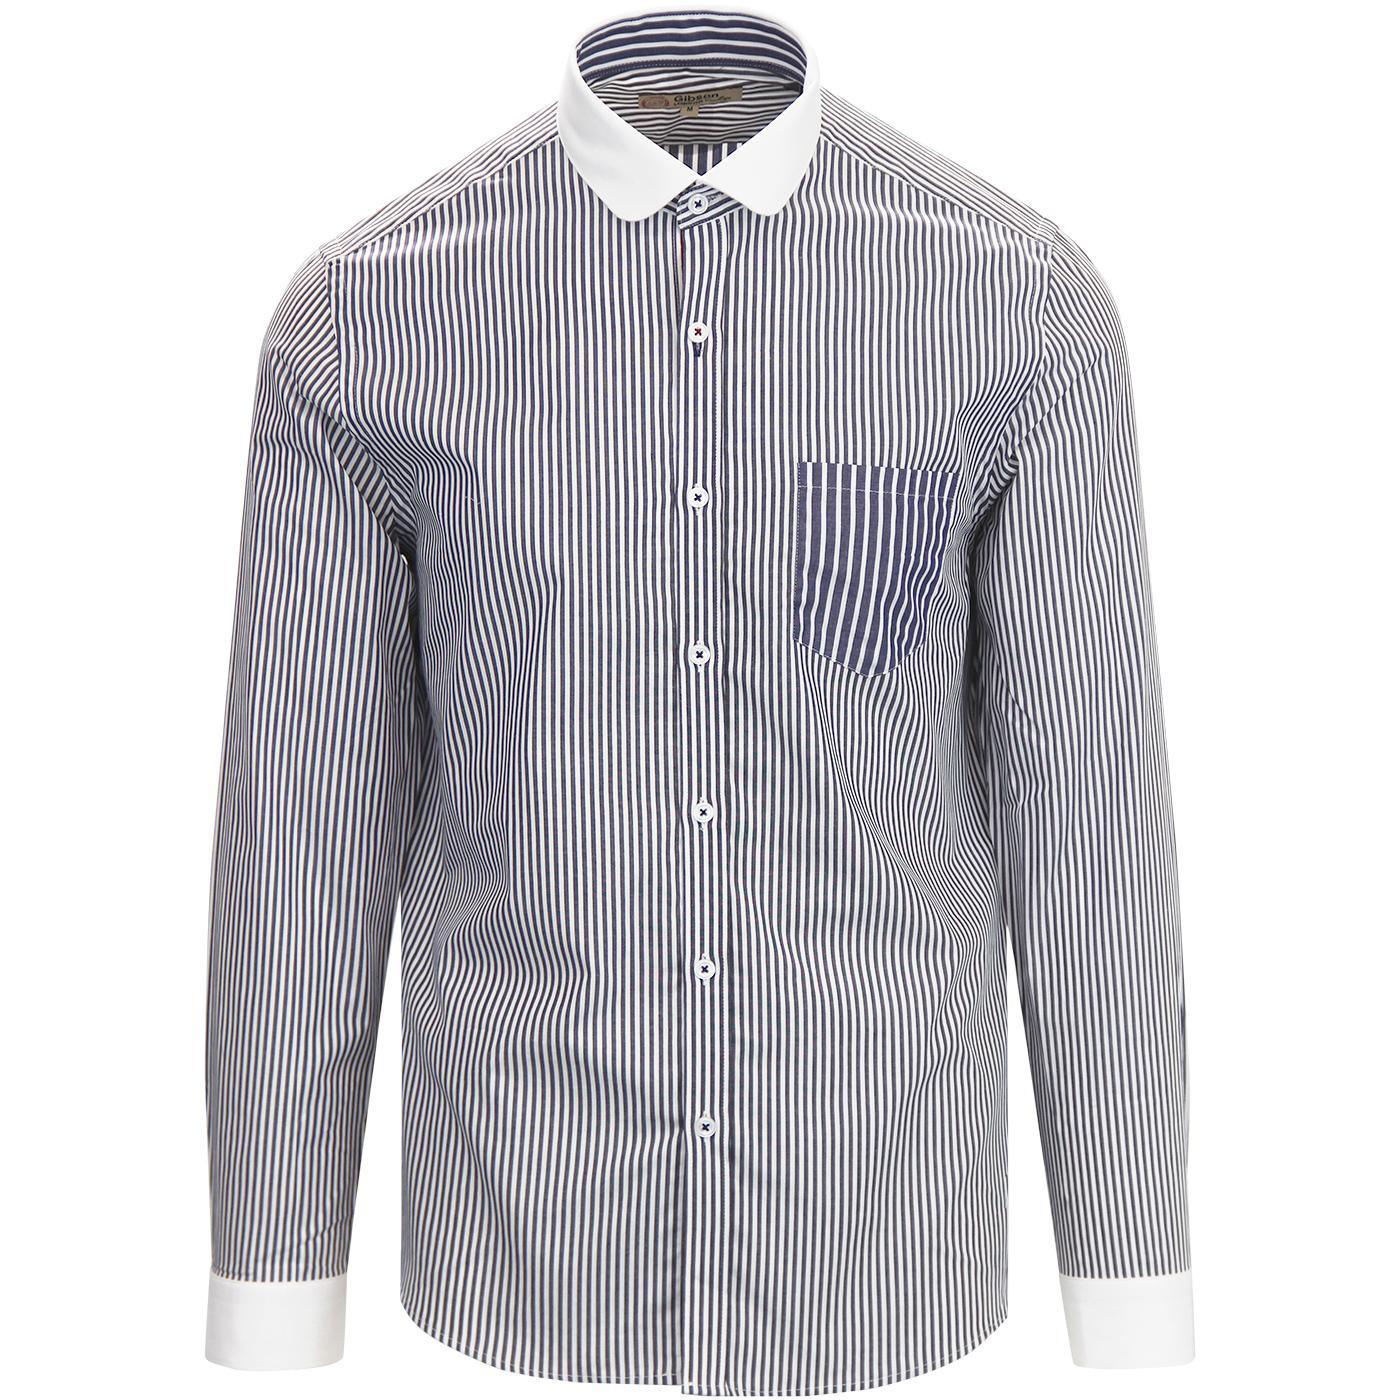 GIBSON LONDON Mod Penny Collar Stripe Shirt NAVY